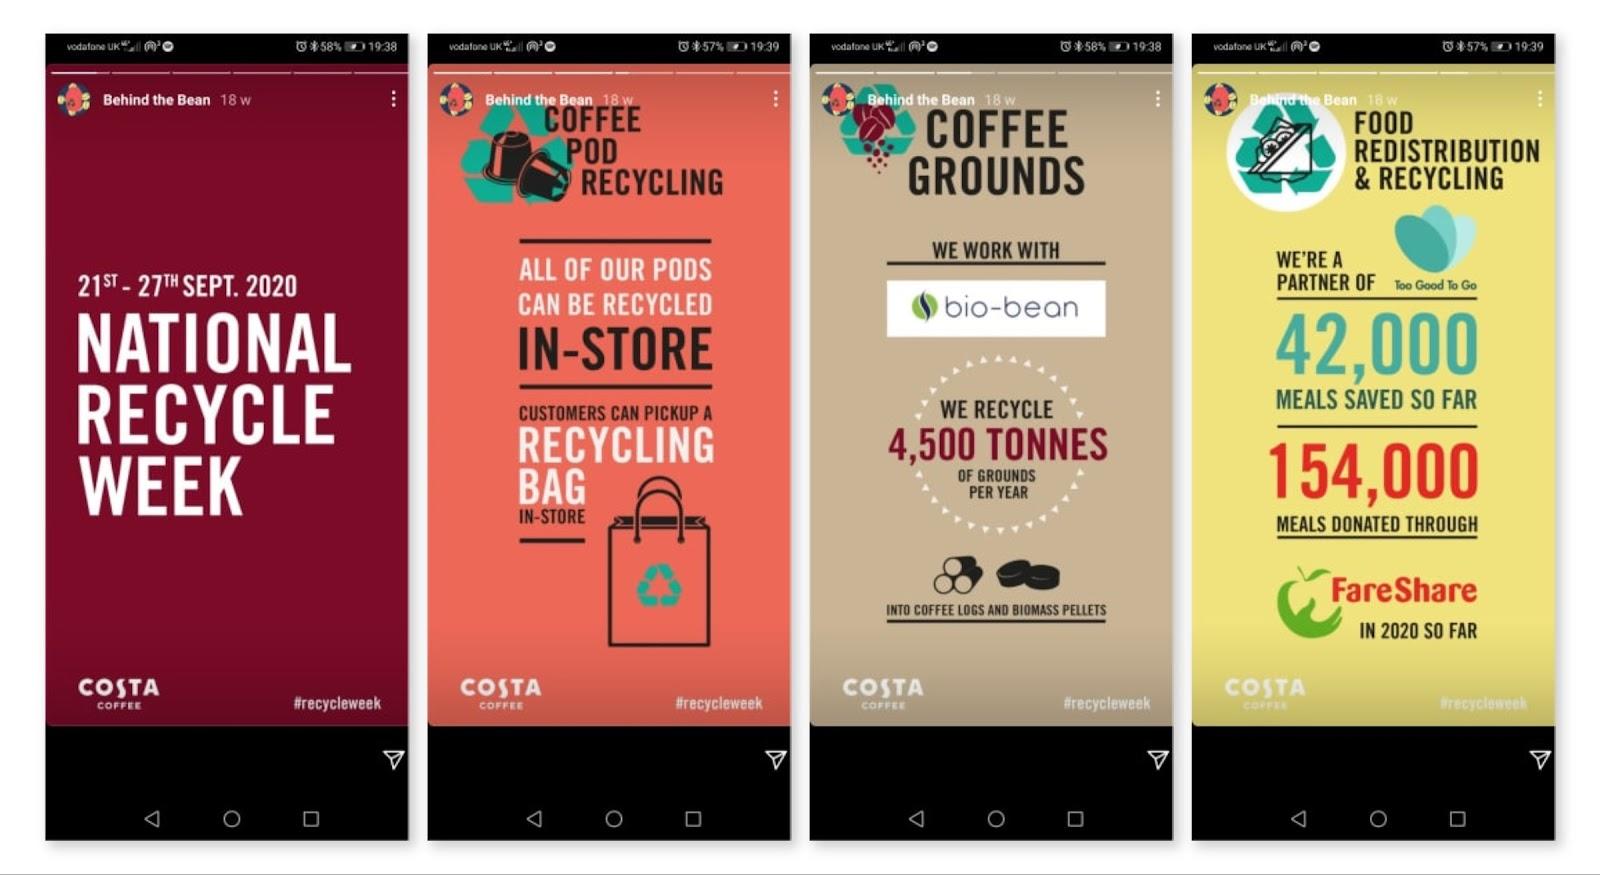 Costa Coffee Instagram Stories